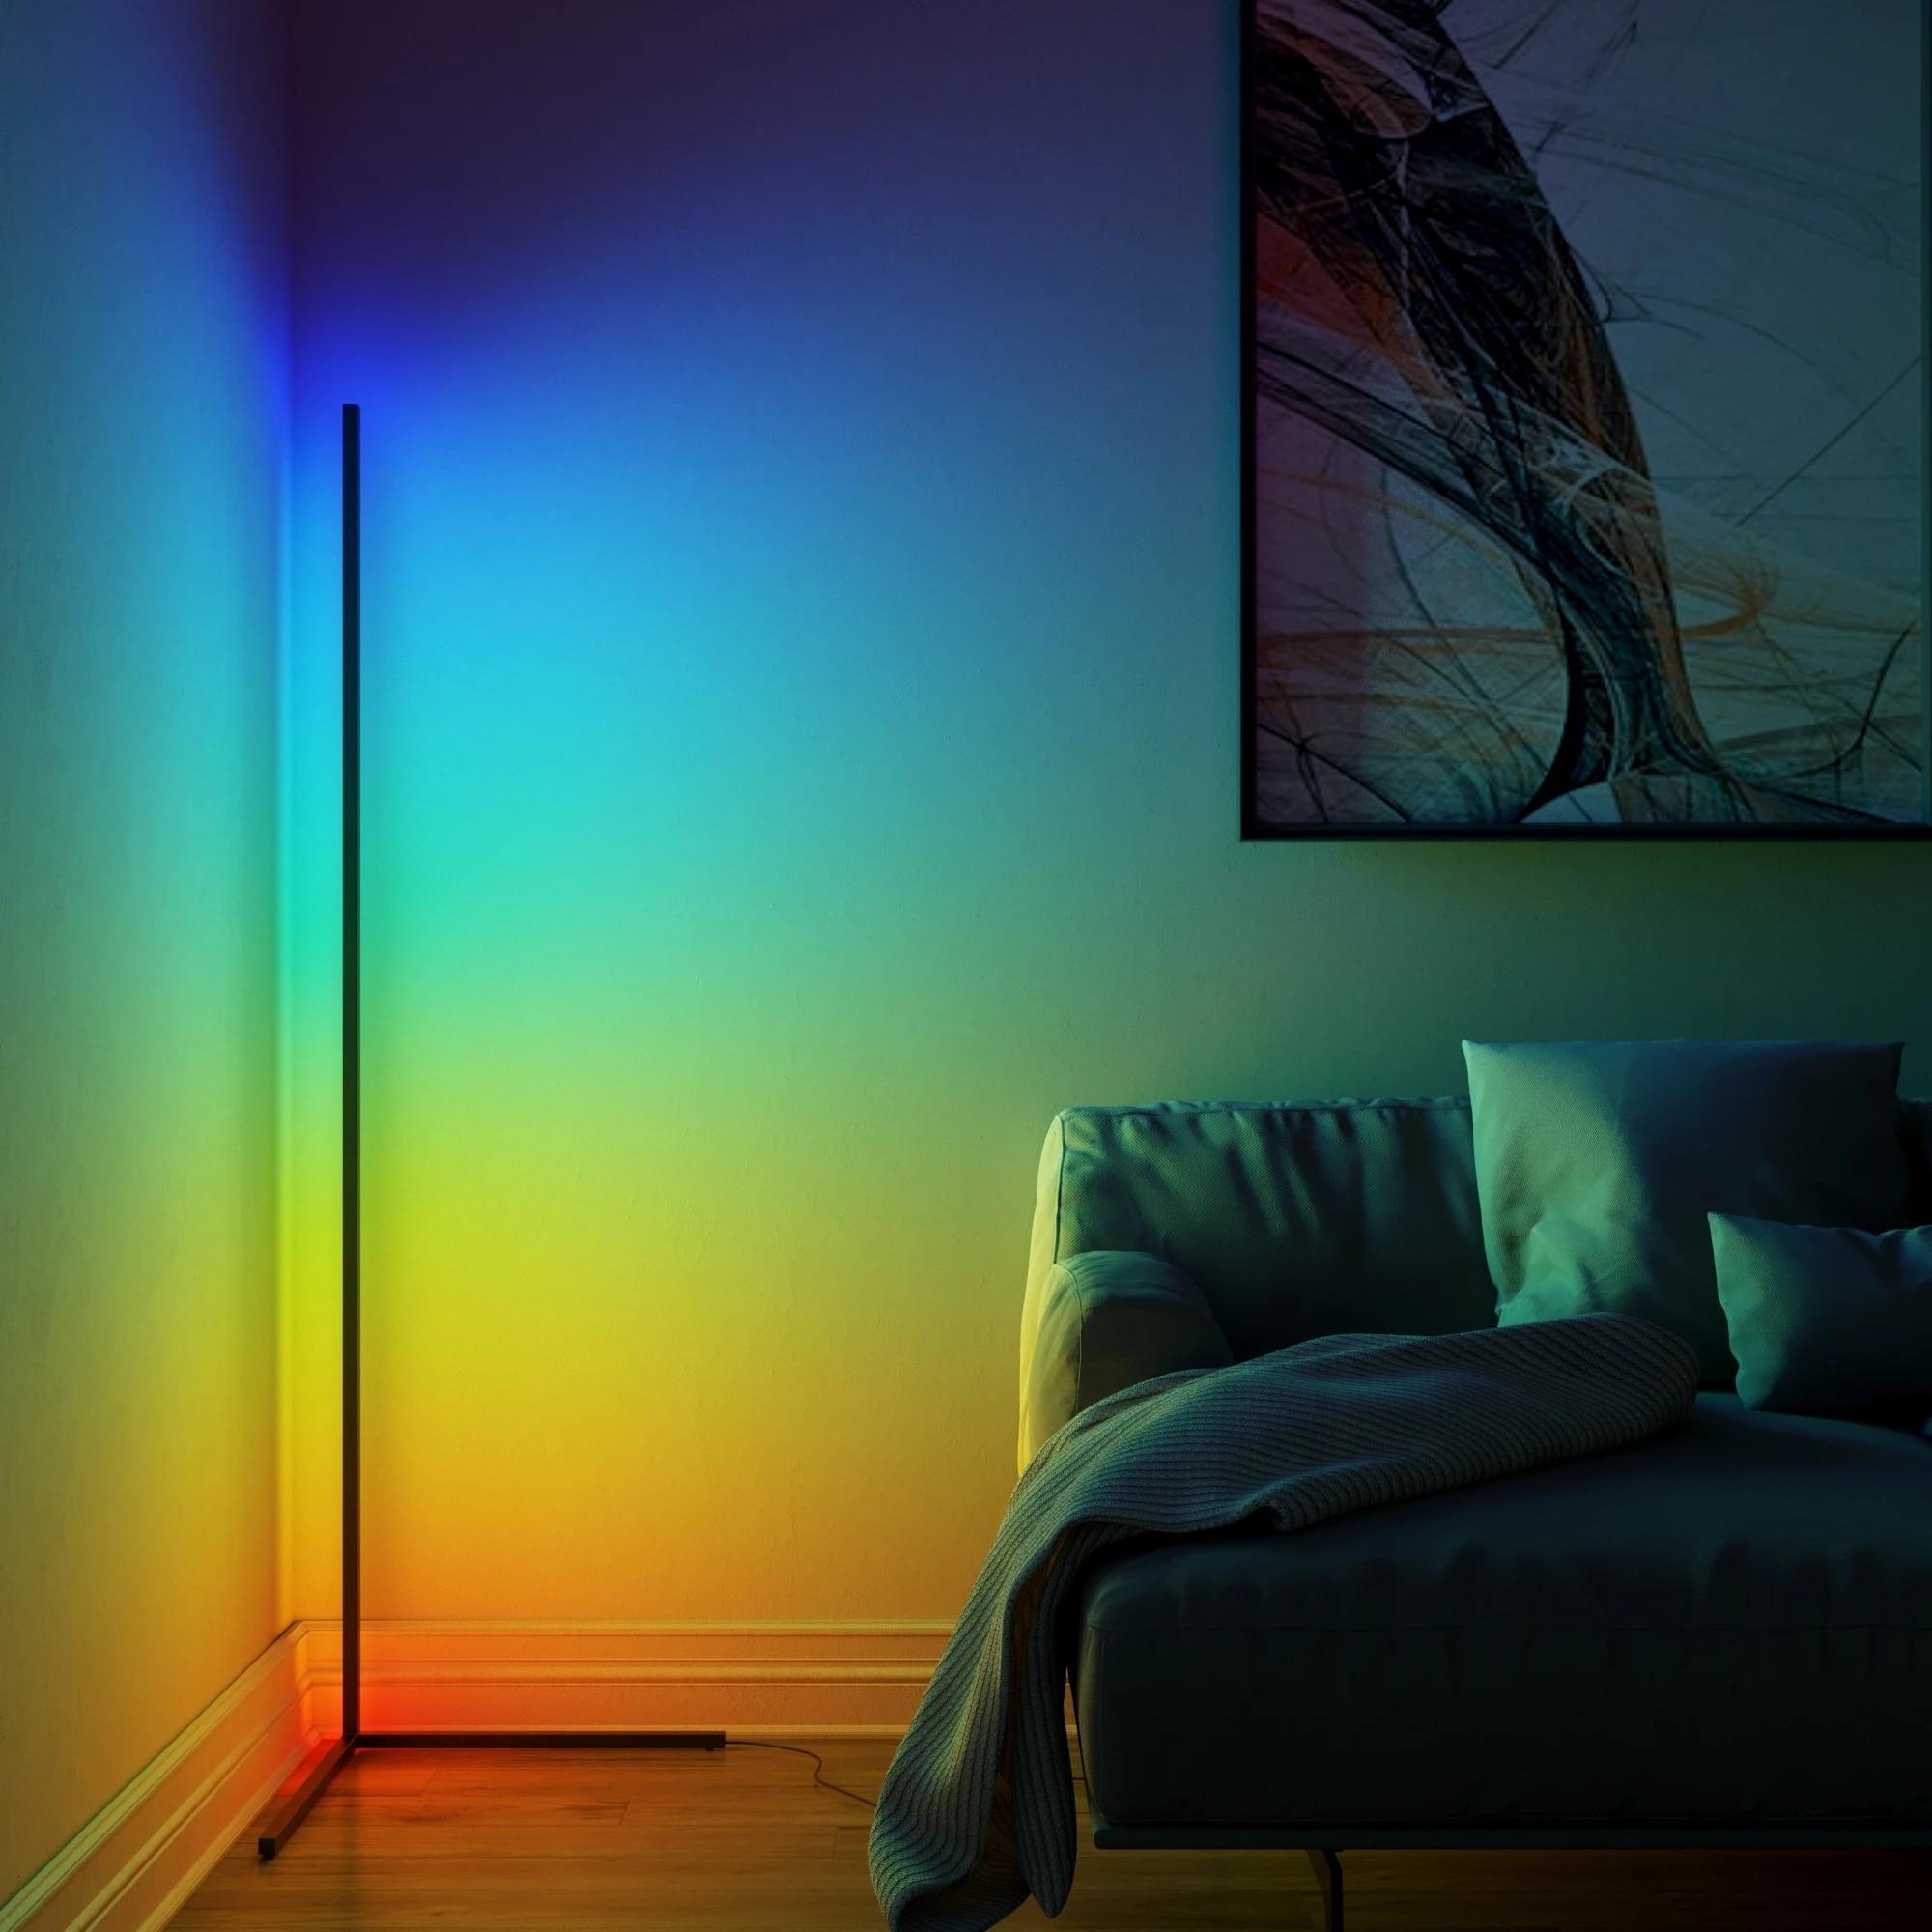 Modern Led Corner Floor Lamp Atmosphere Light Lights Colorful Bedroom Living Room Home Decoration Indoor Lighting Standing Lamps Floor Lamps Aliexpress